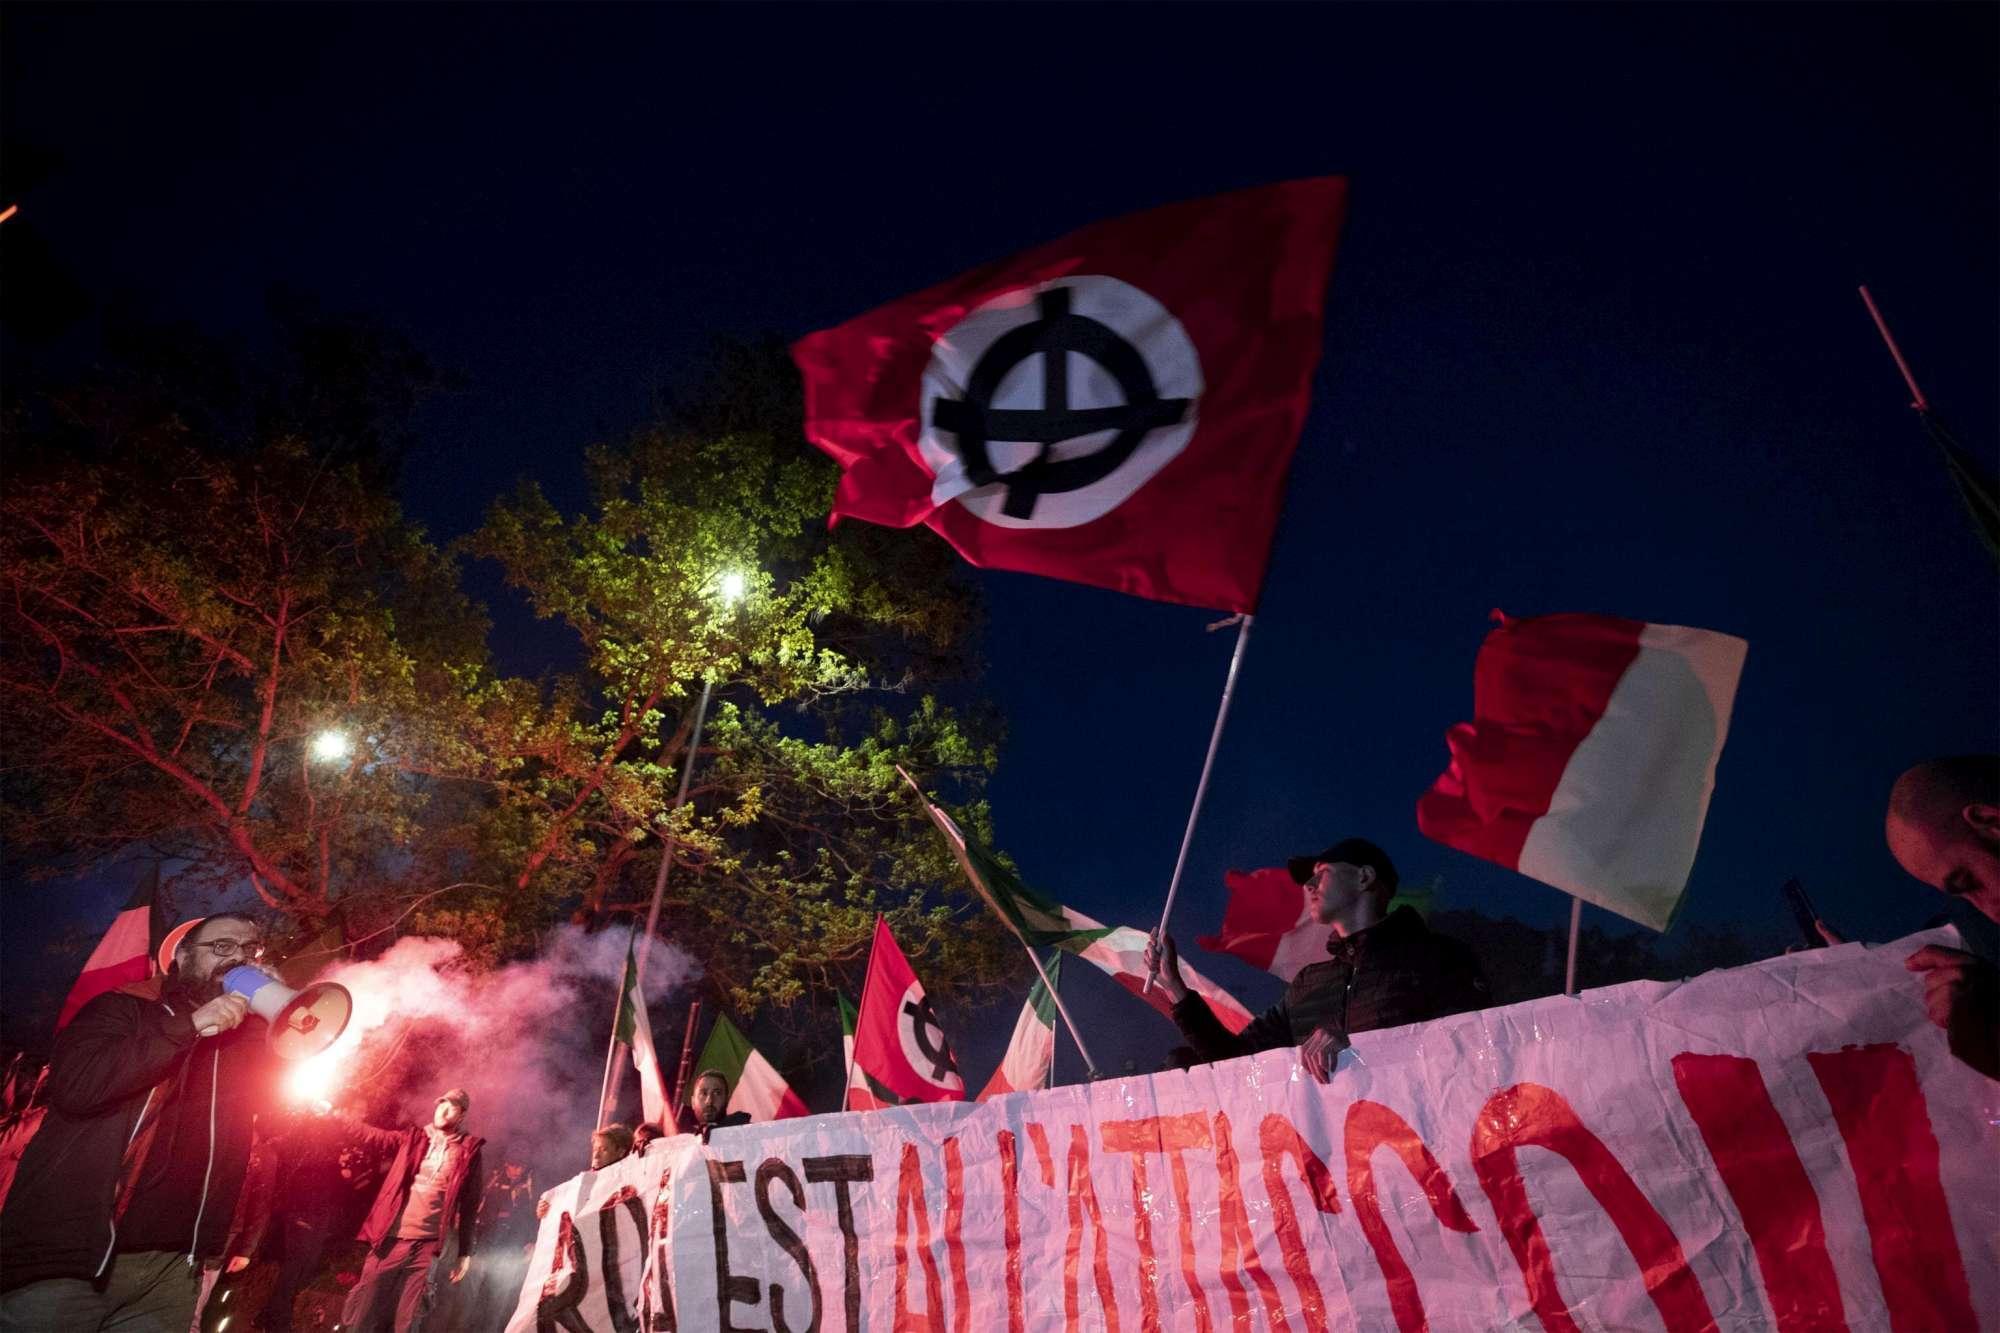 Roma, proteste anti nomadi a Torre Maura: 41 denunciati